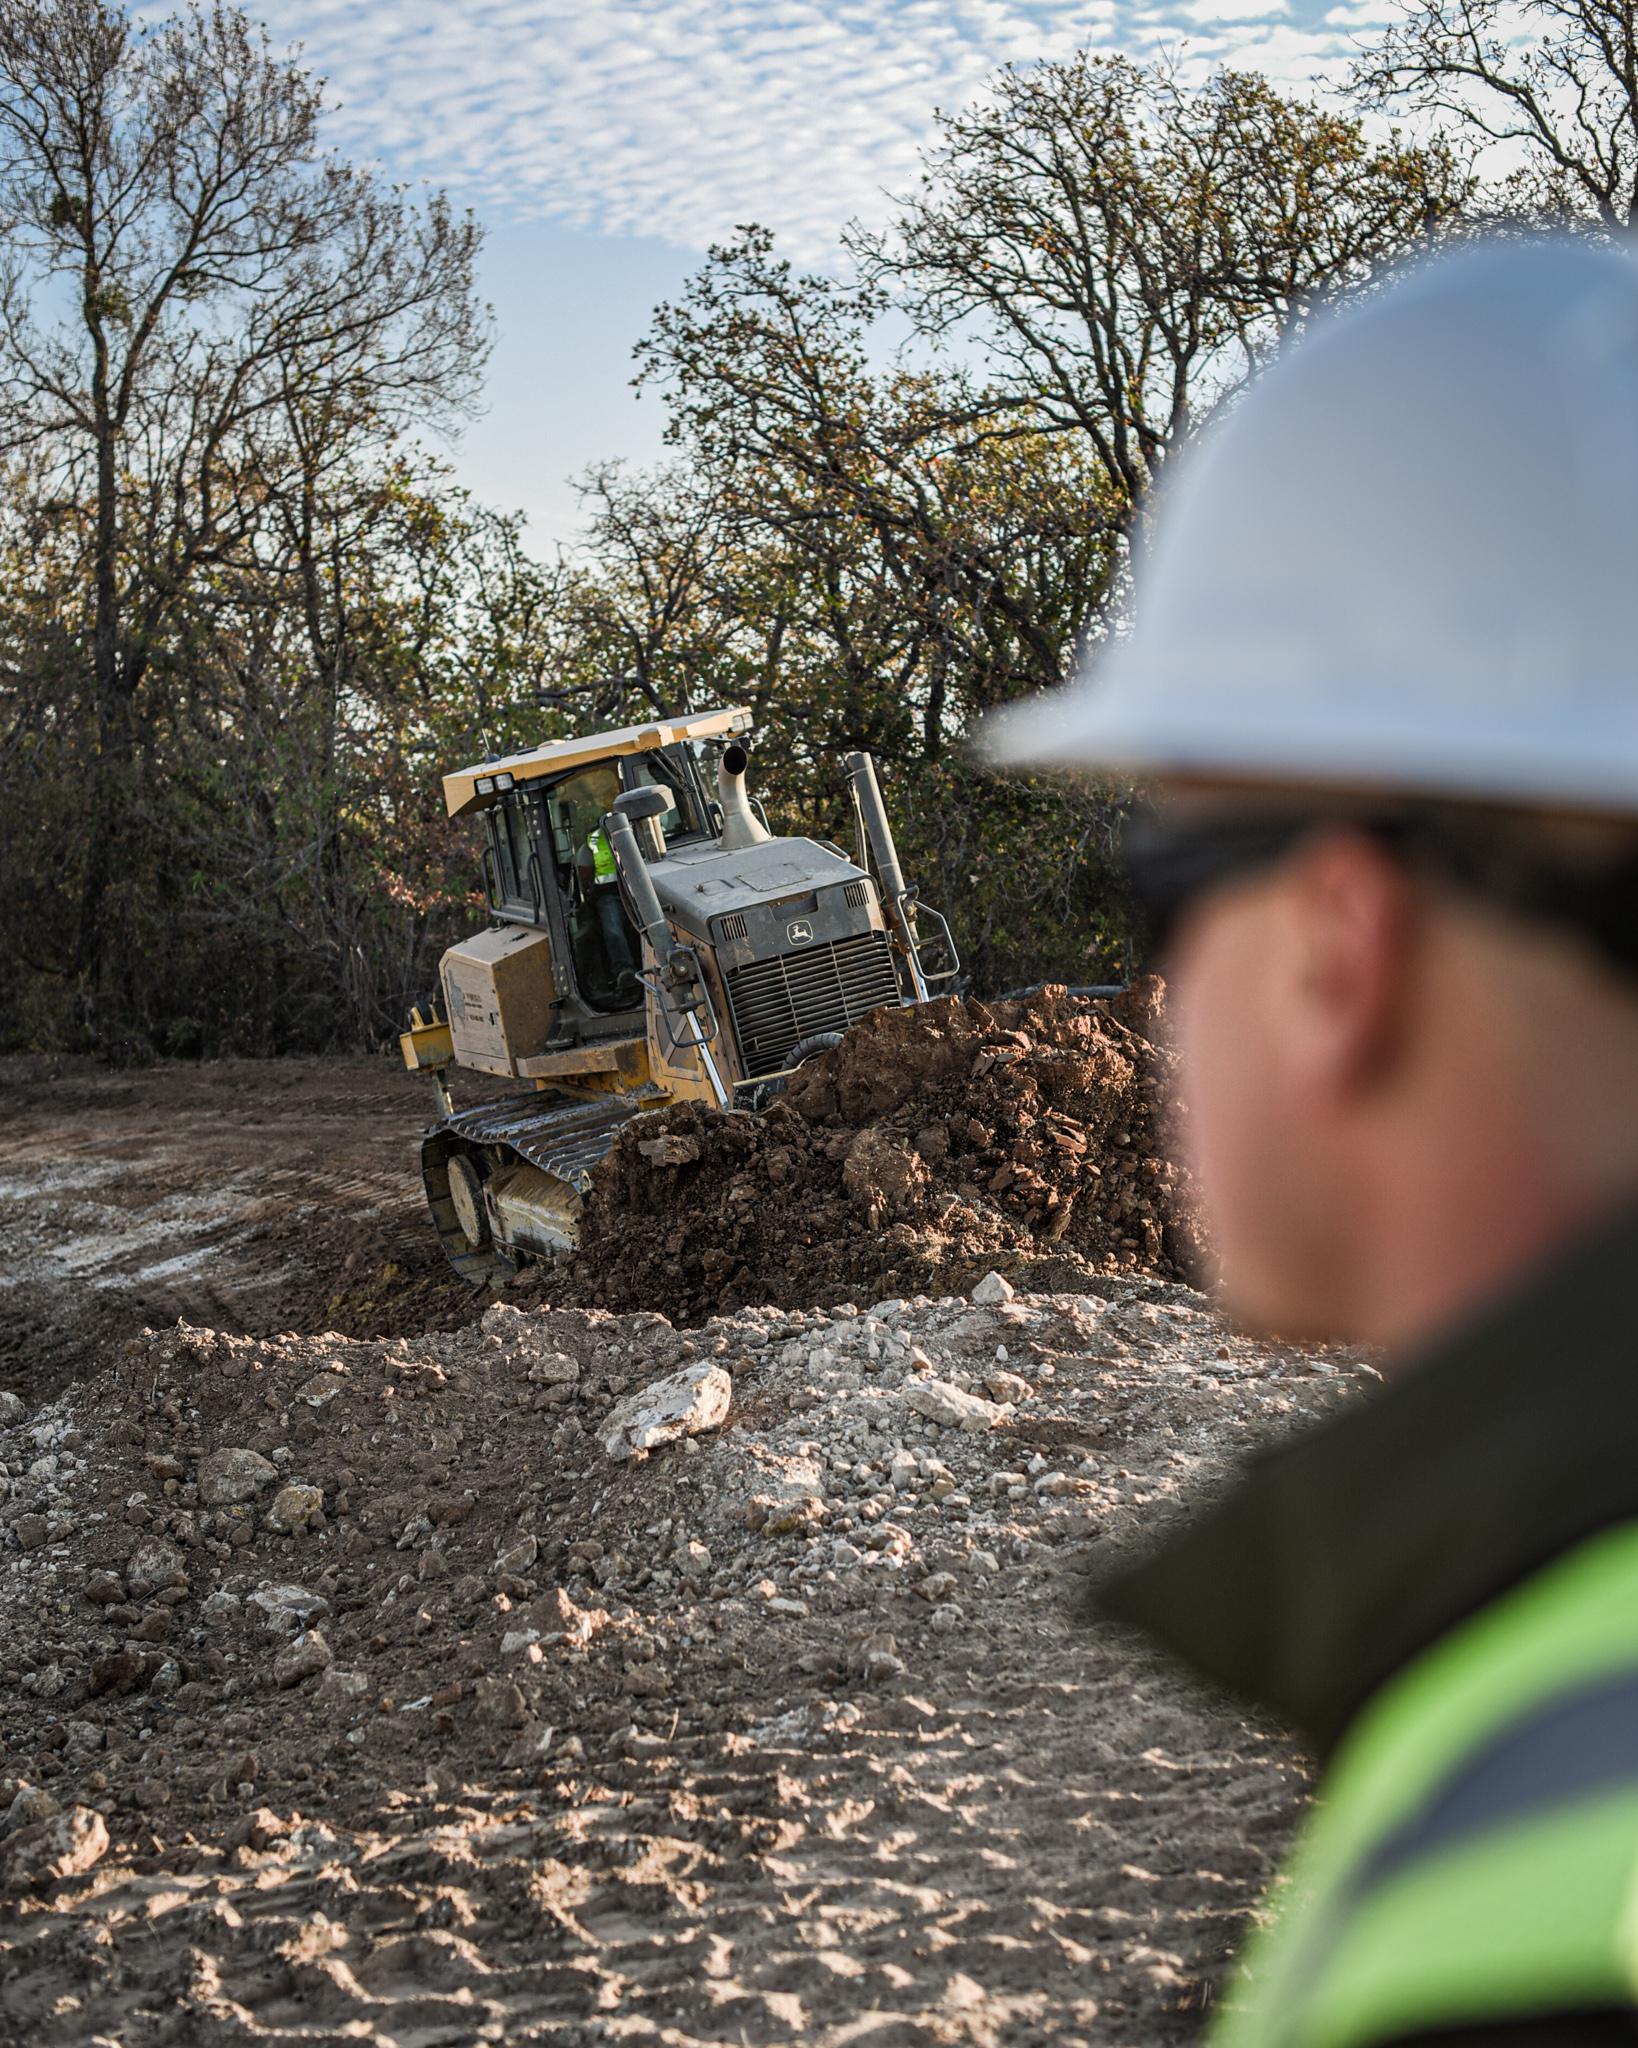 John Deere front loader clearing a job site.